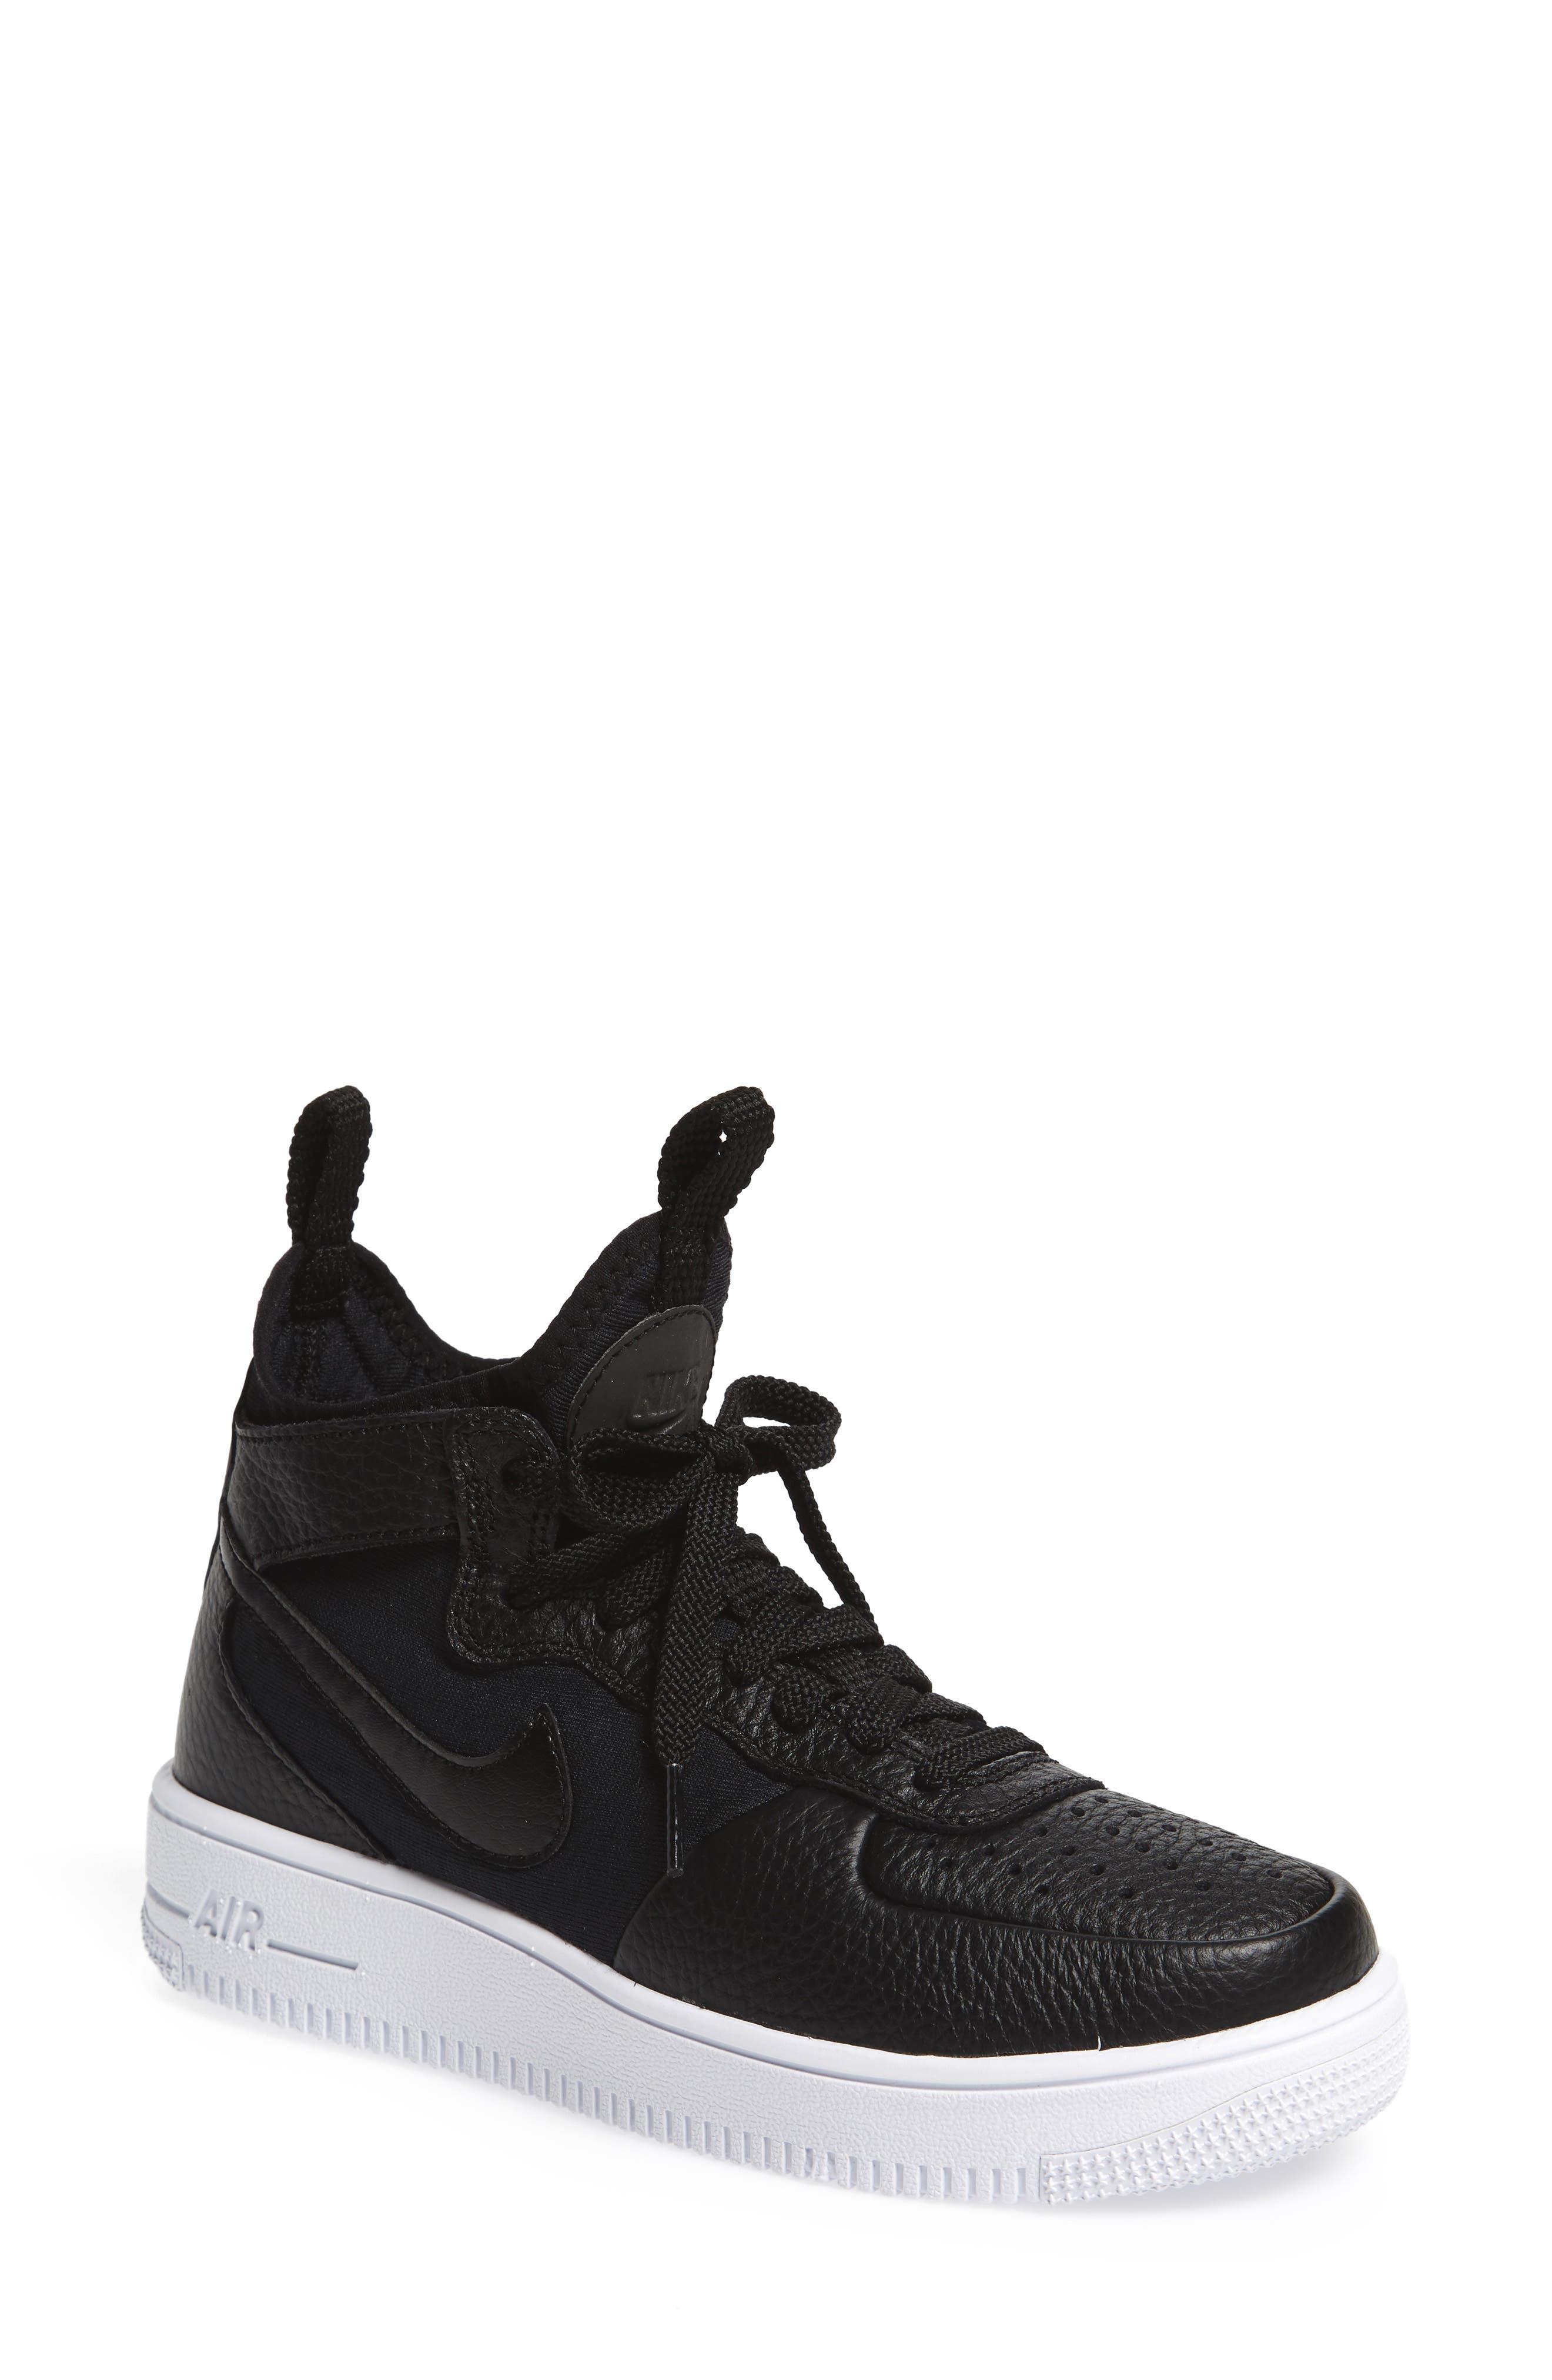 Air Force 1 Ultraforce Mid Sneaker,                             Main thumbnail 1, color,                             005